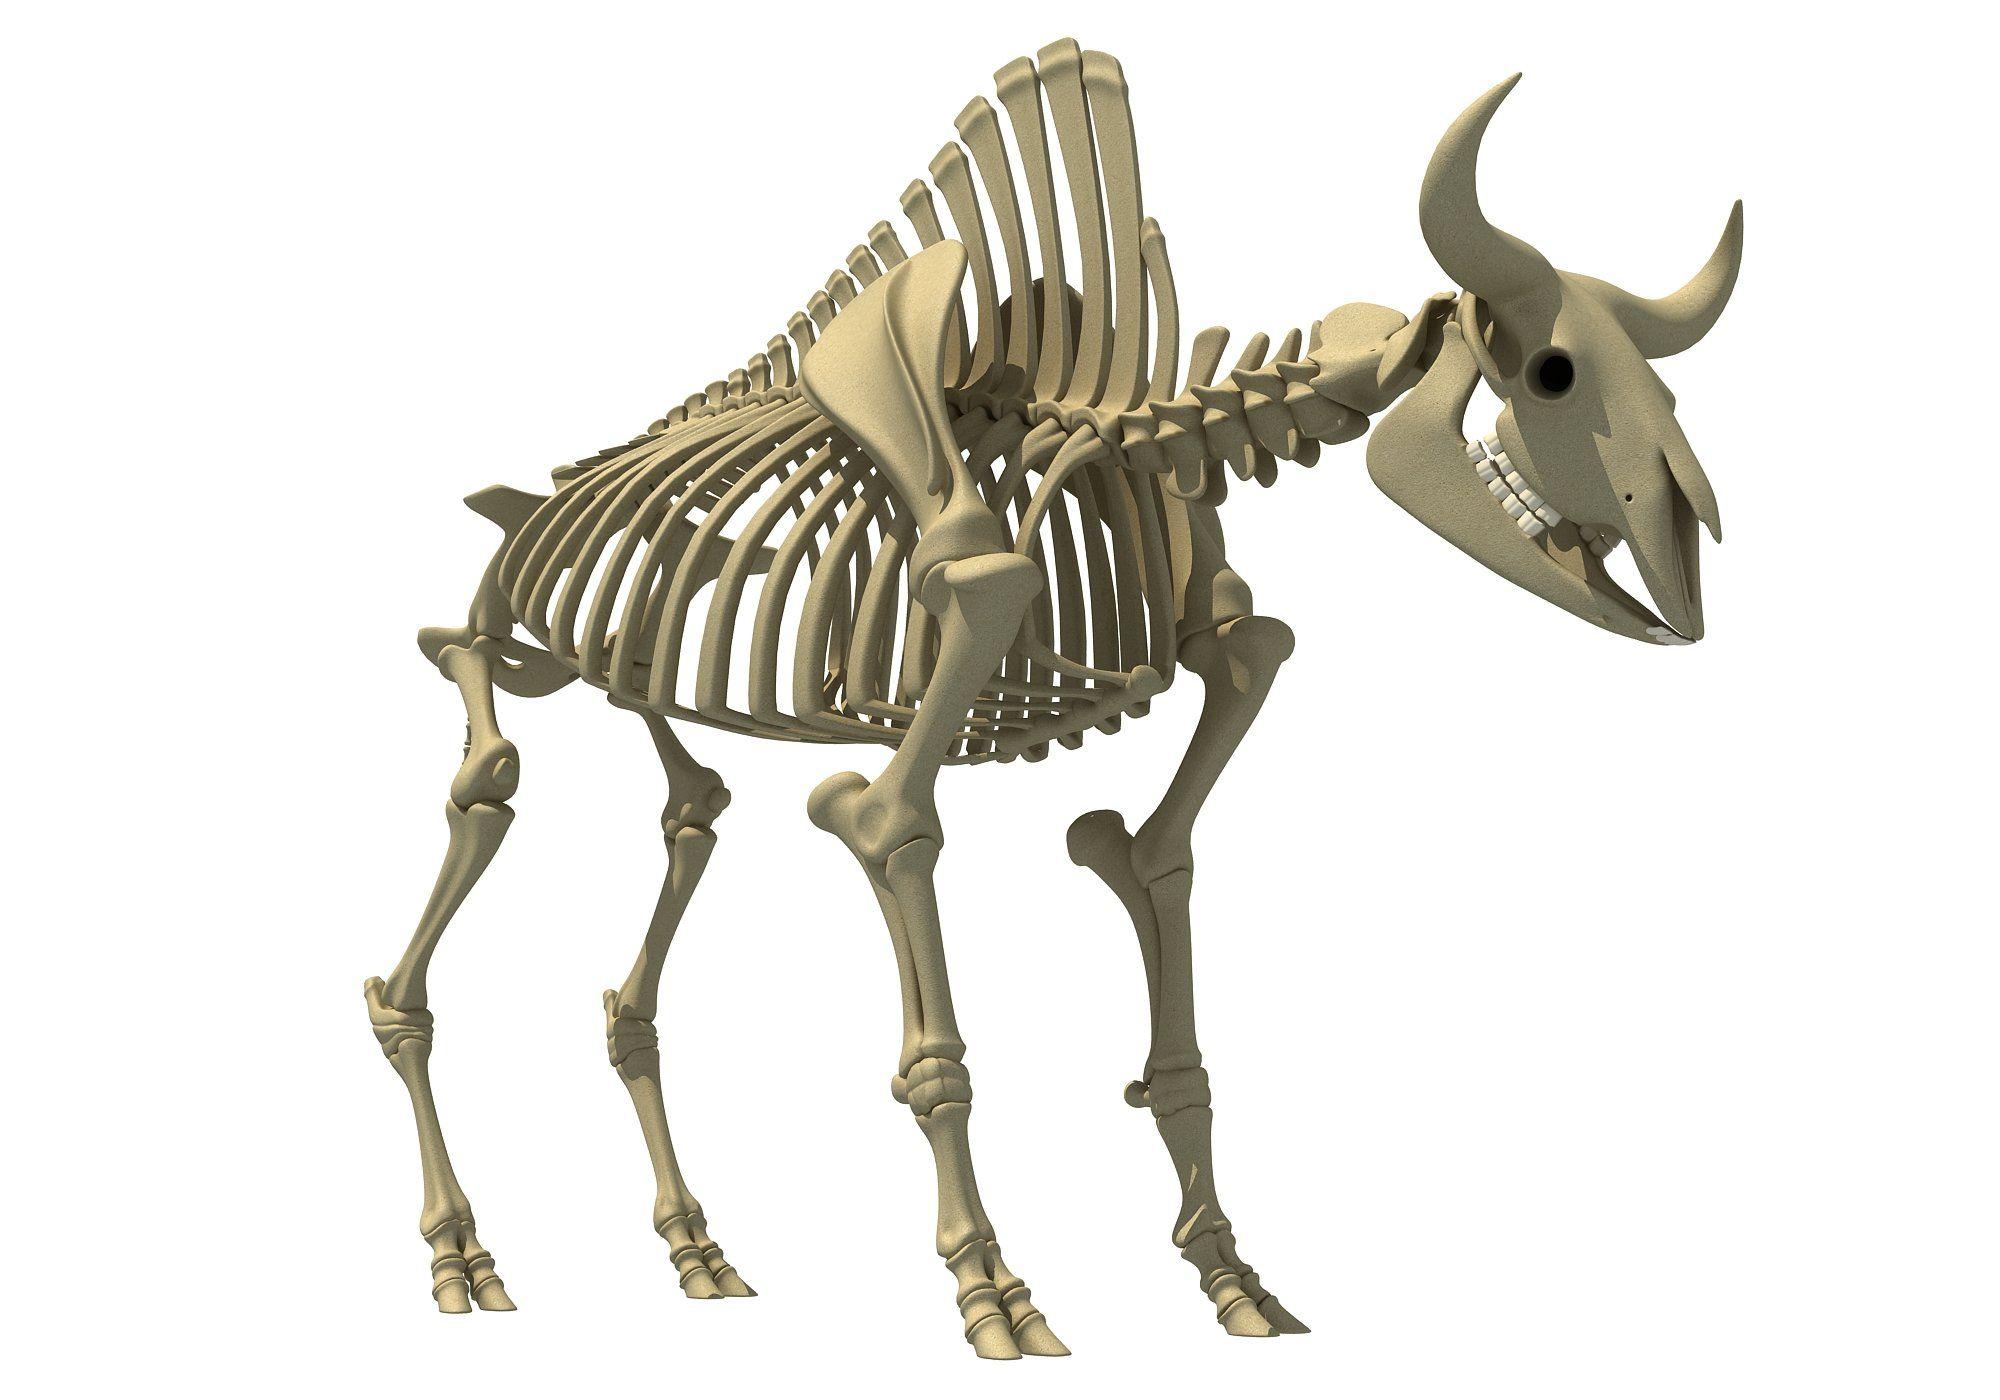 Bison Skeleton | Bison Bulls Anatomy | Skeleton, Animal